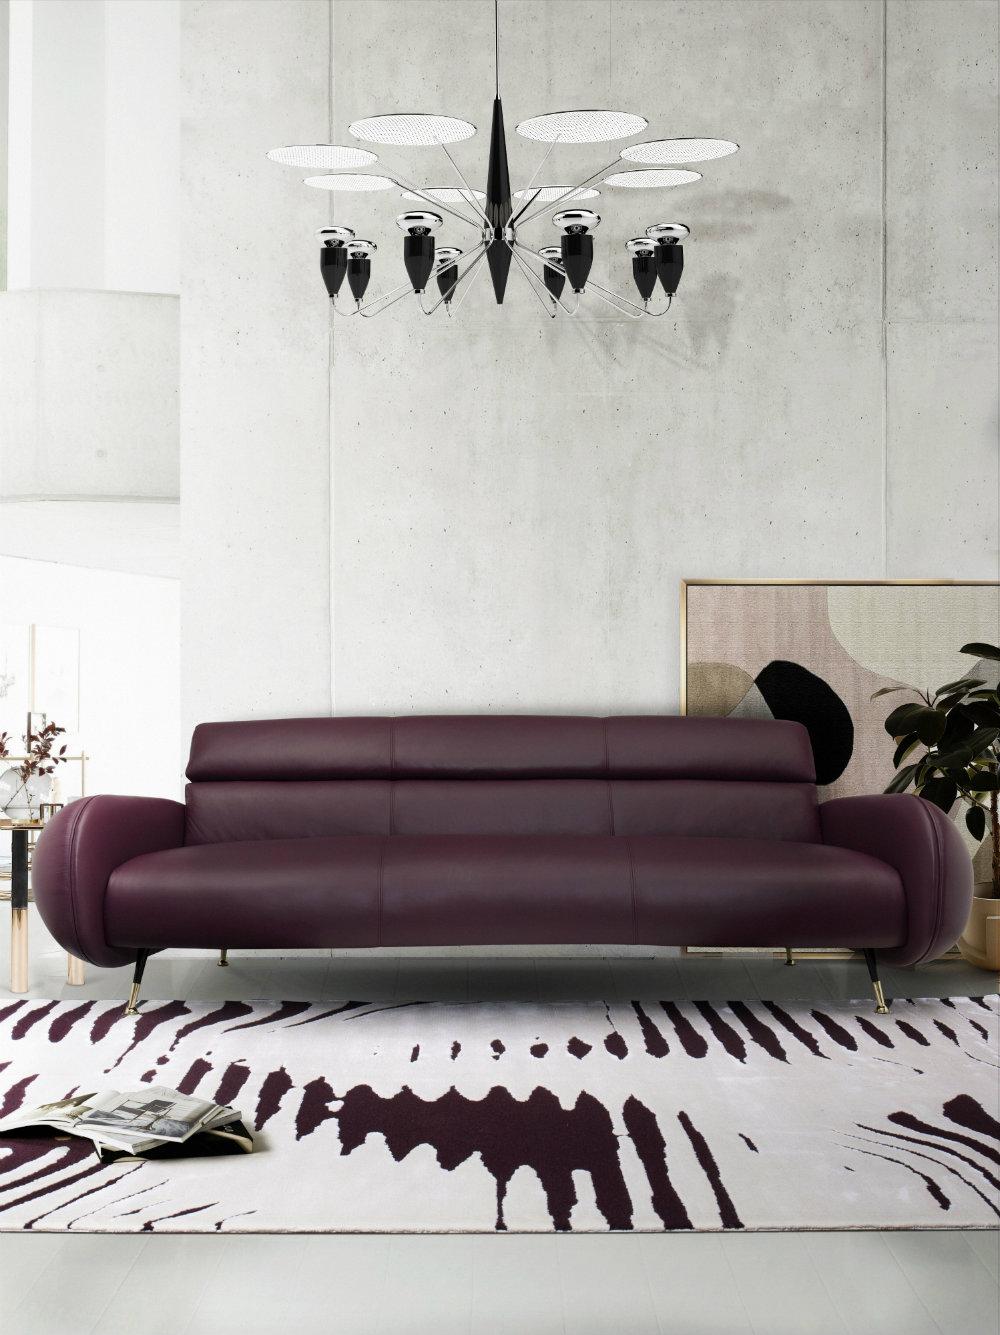 living room ideas 30 Best Living Room Ideas For 2020 best living room ideas 2020 25